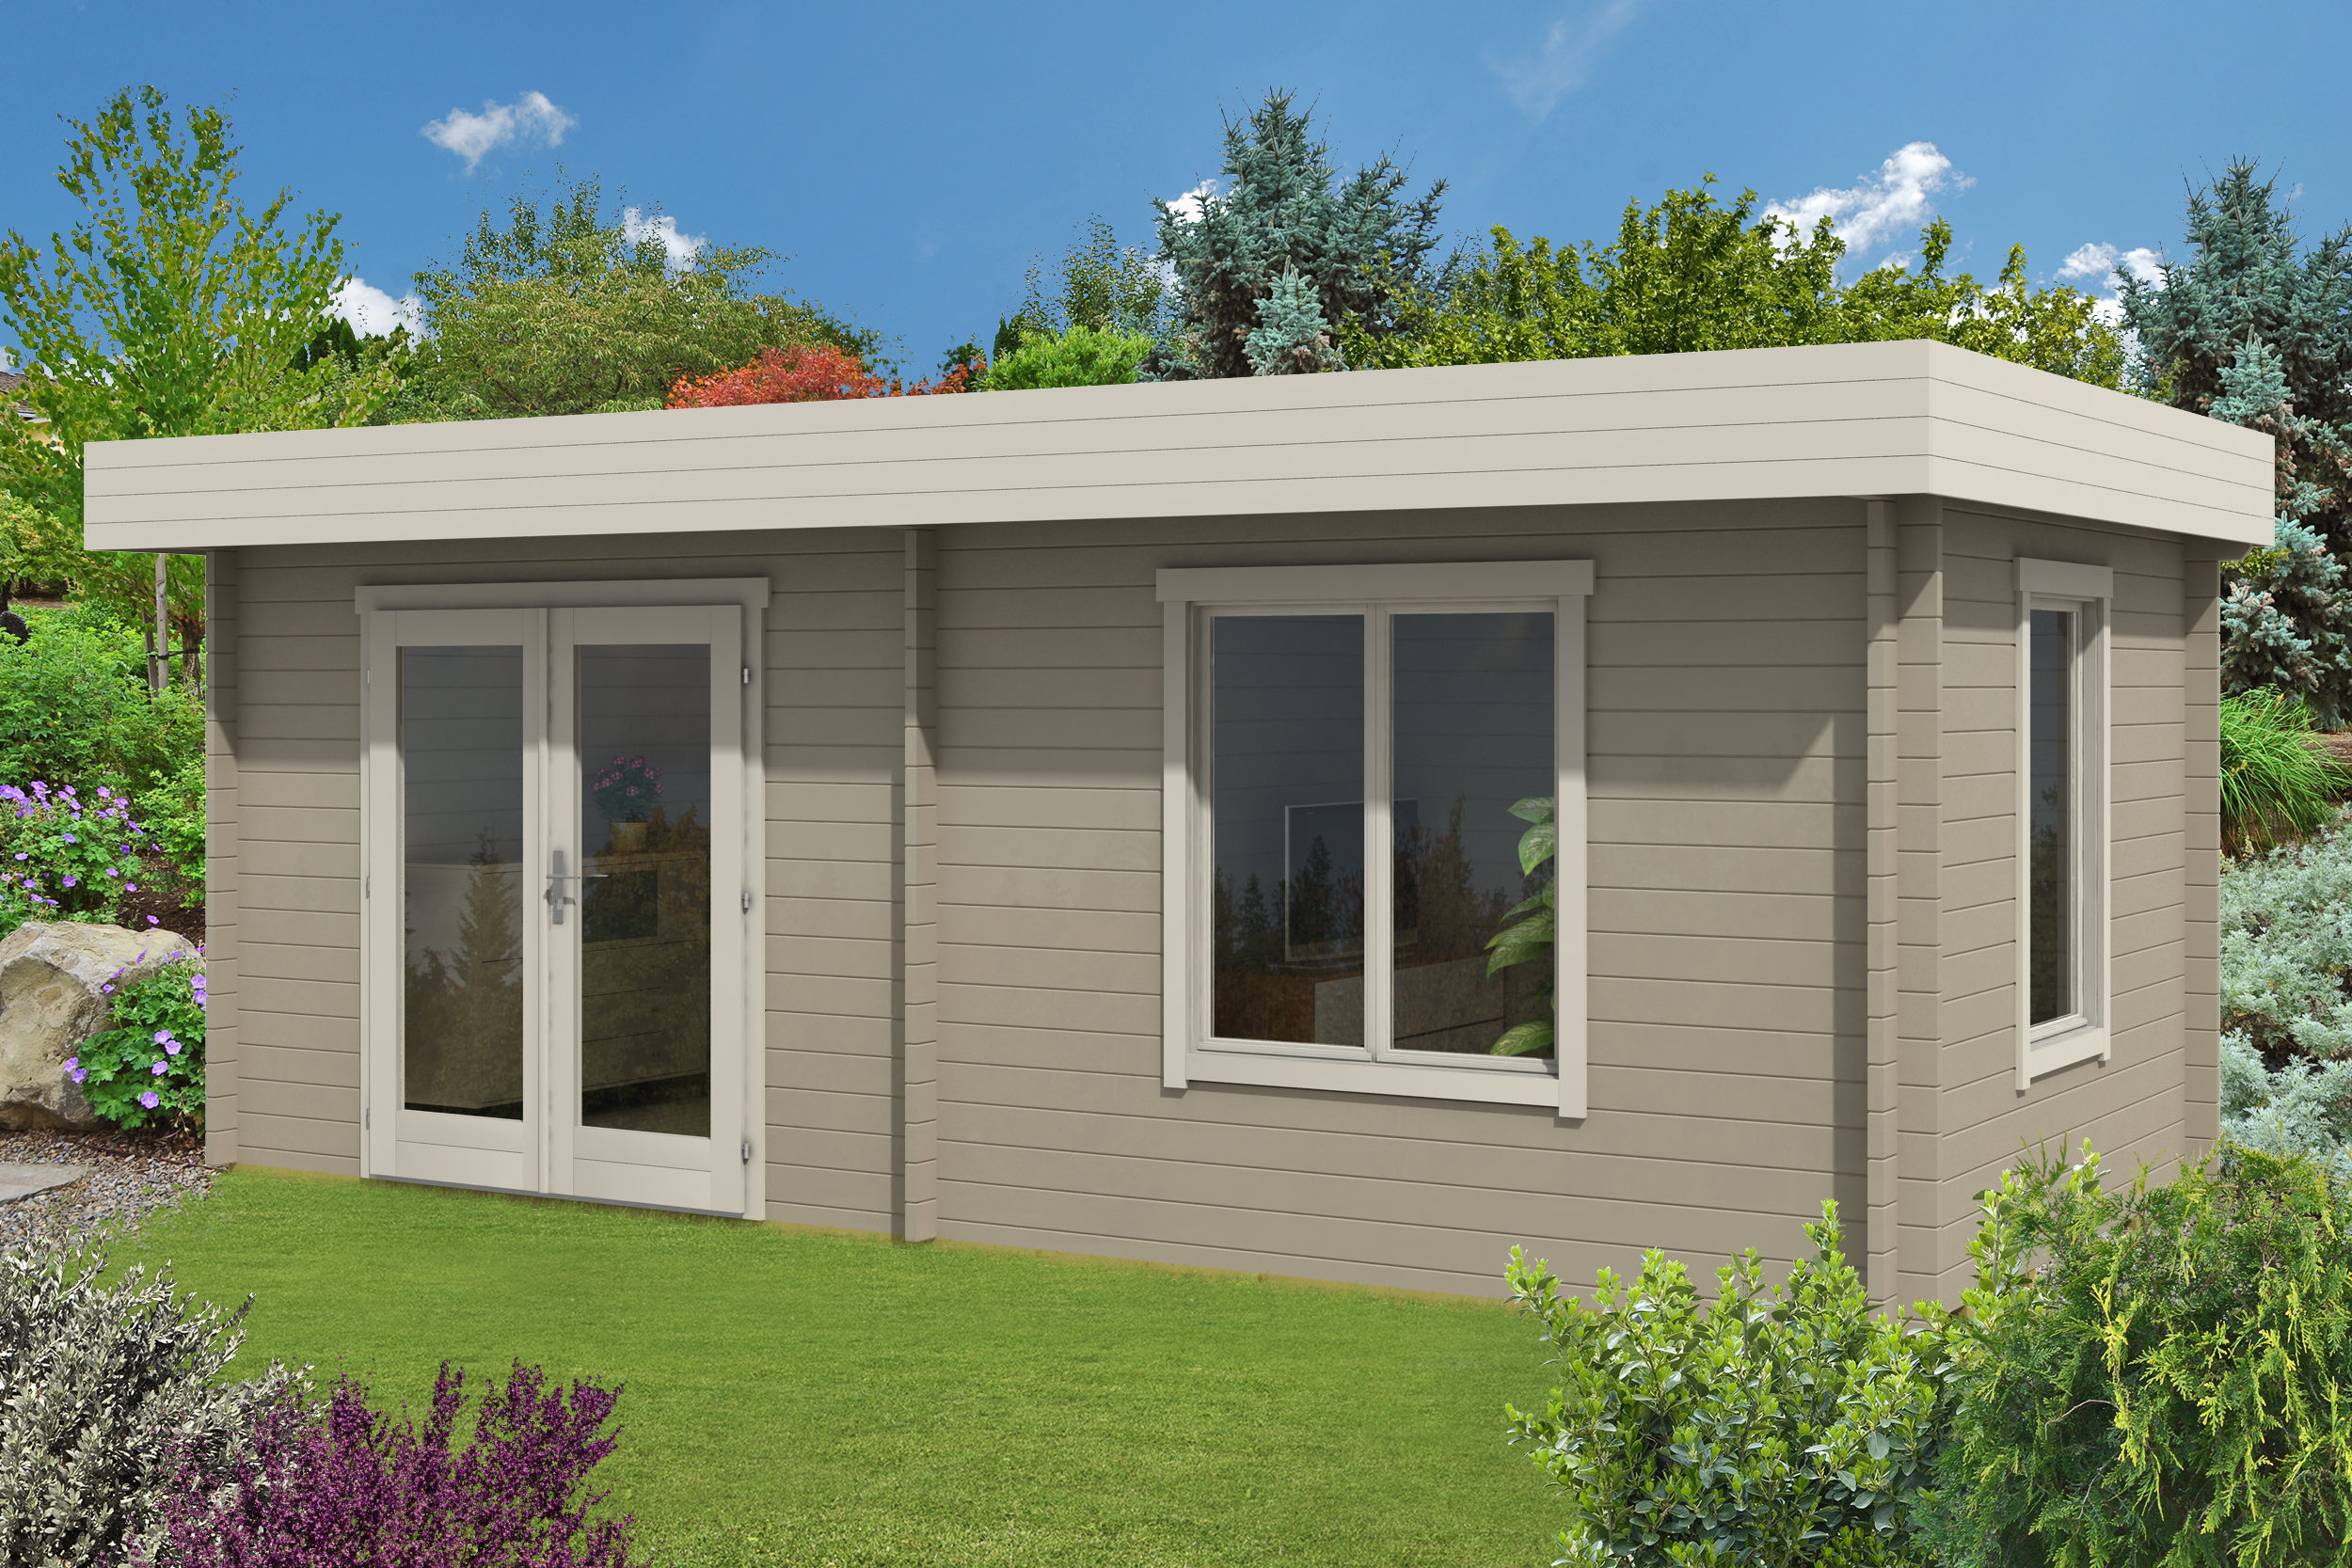 gartenhaus orleans 40 iso a z gartenhaus gmbh. Black Bedroom Furniture Sets. Home Design Ideas